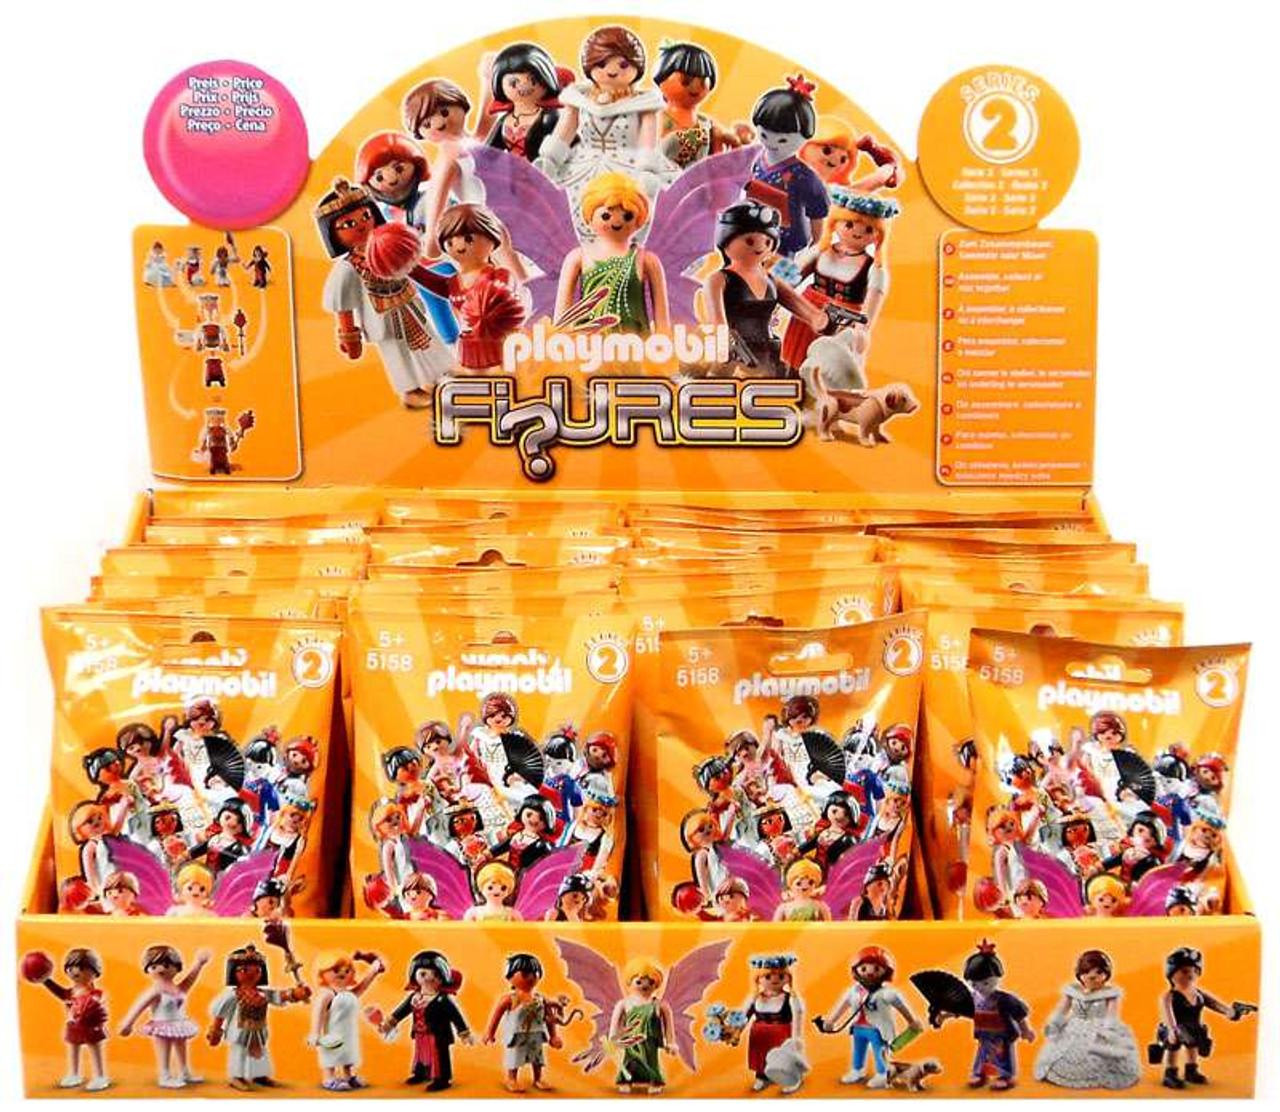 playmobil figures series 2 orange mystery box 48 packs